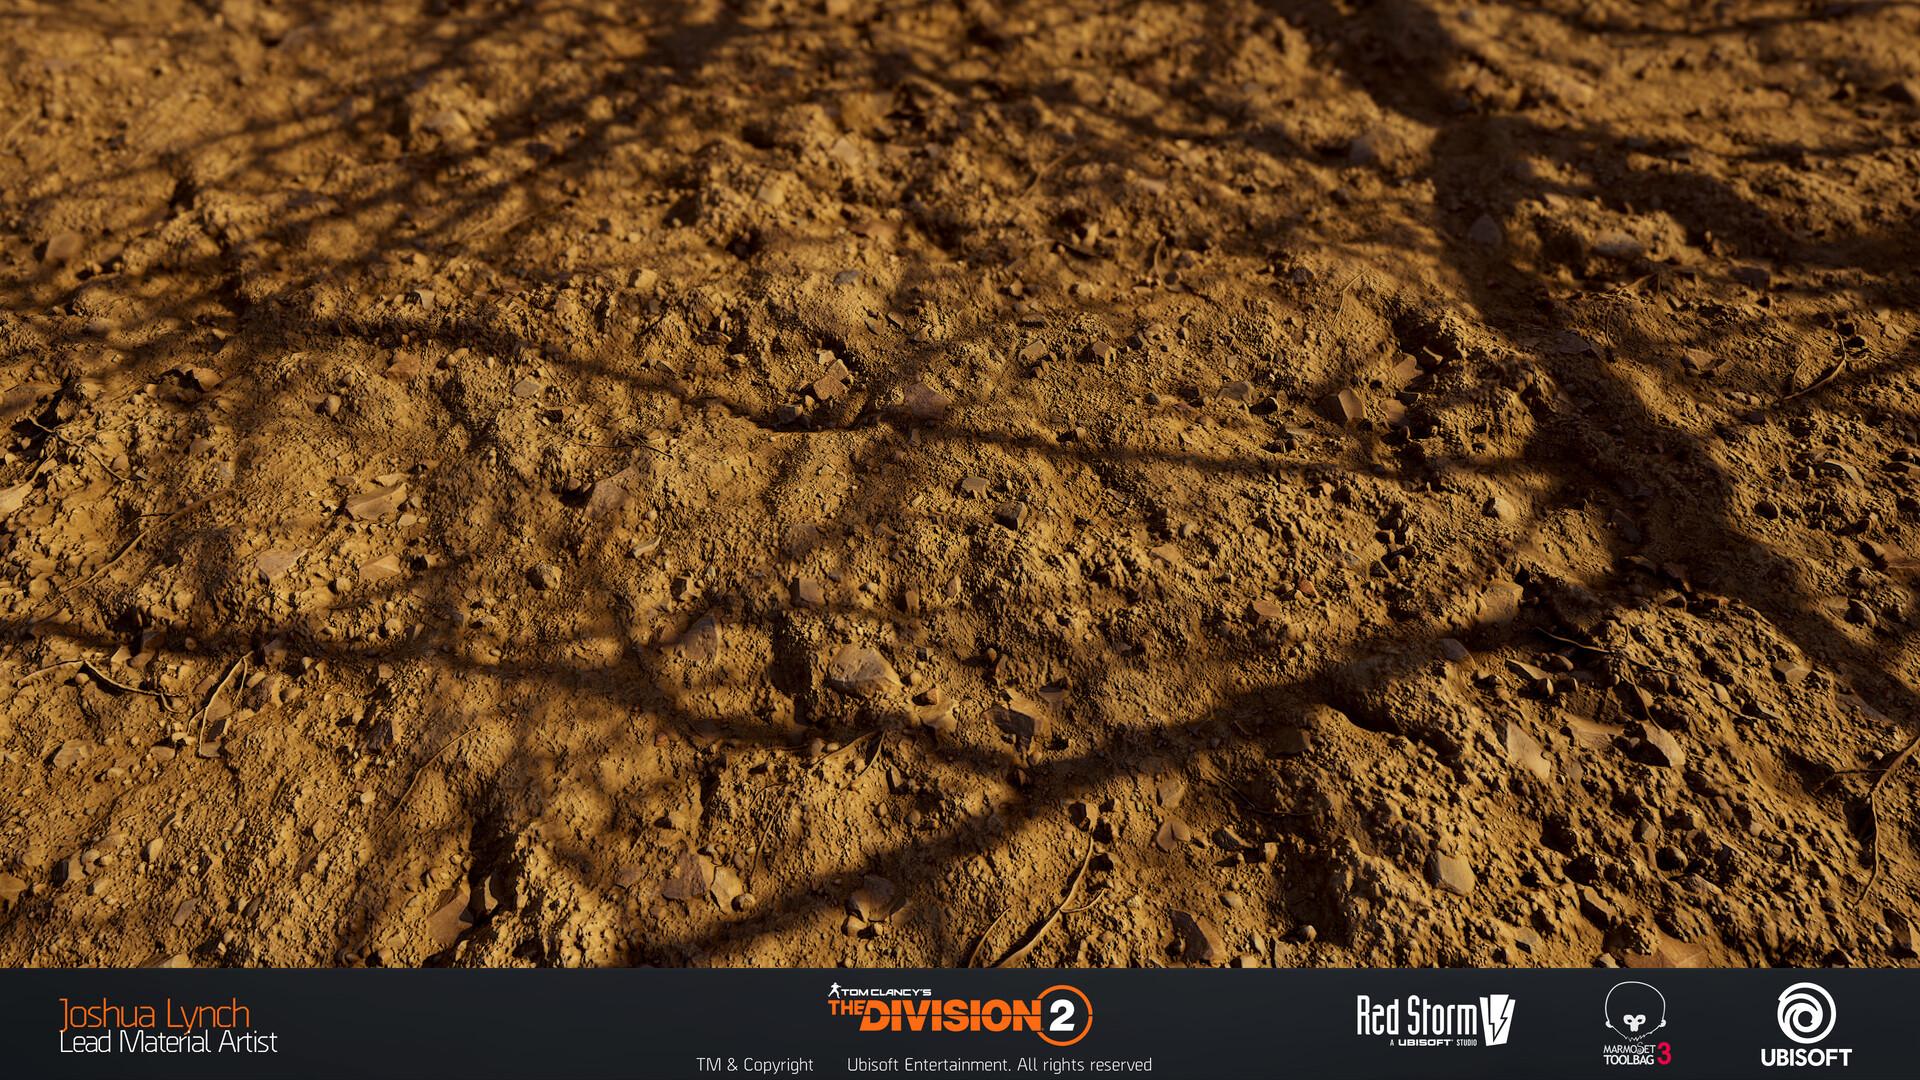 Joshua lynch division 2 josh lynch soil mud dry ground